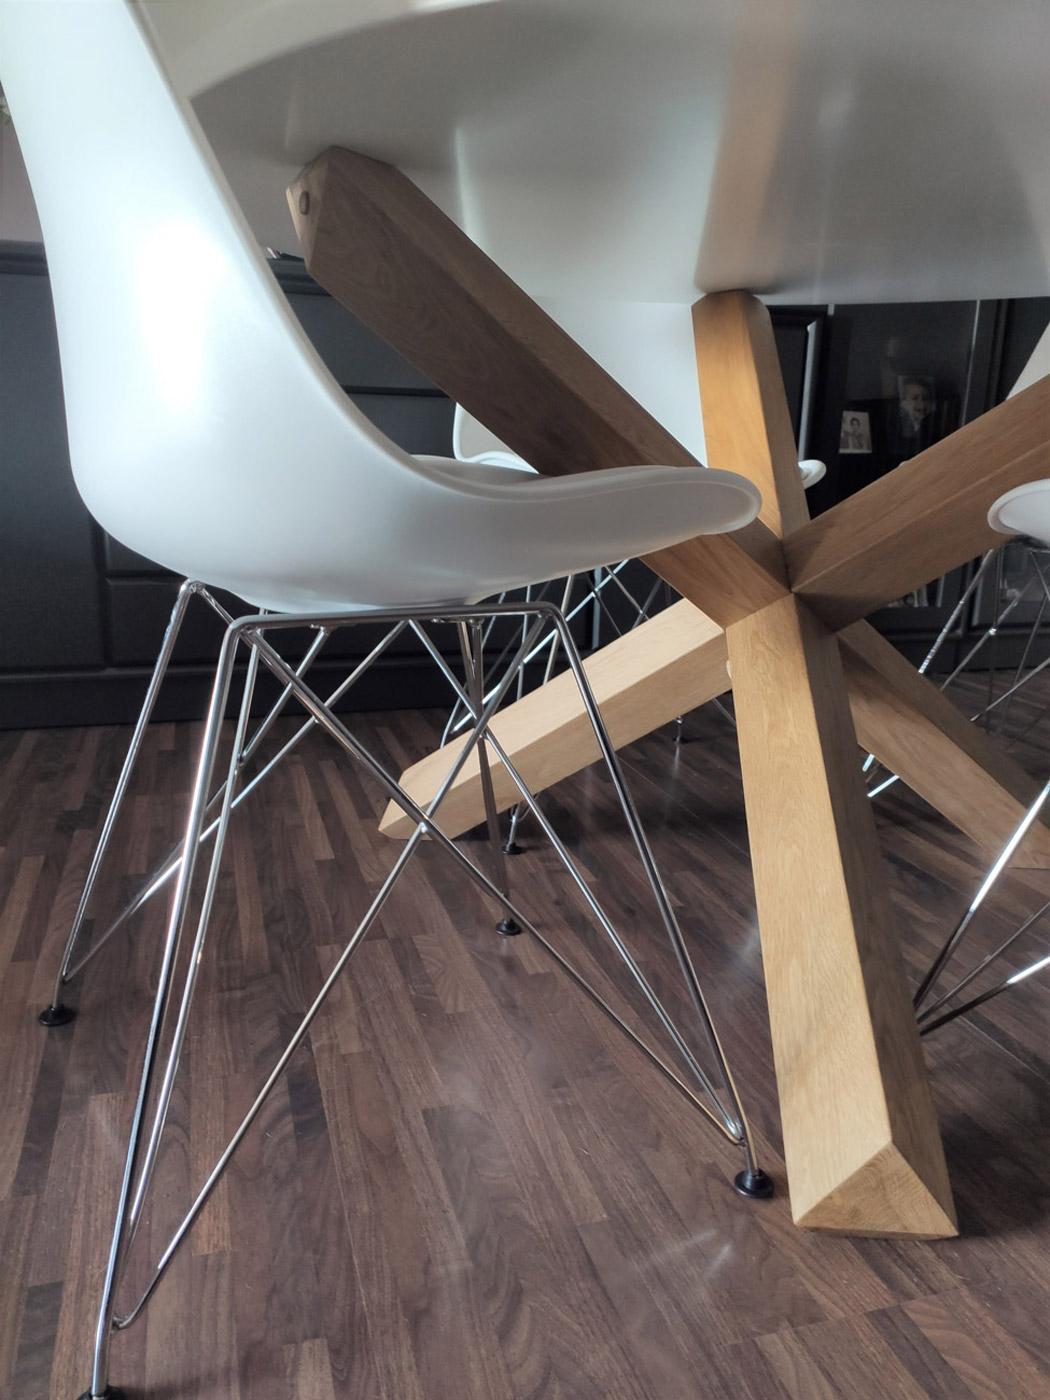 atelier-4-anna-junca-reforma-reformes-interiorista-arquitectura-interior-disseny-interiors-banyoles-girona-costa-brava-emporda-habitatge-comercial-relooking-menjador-3